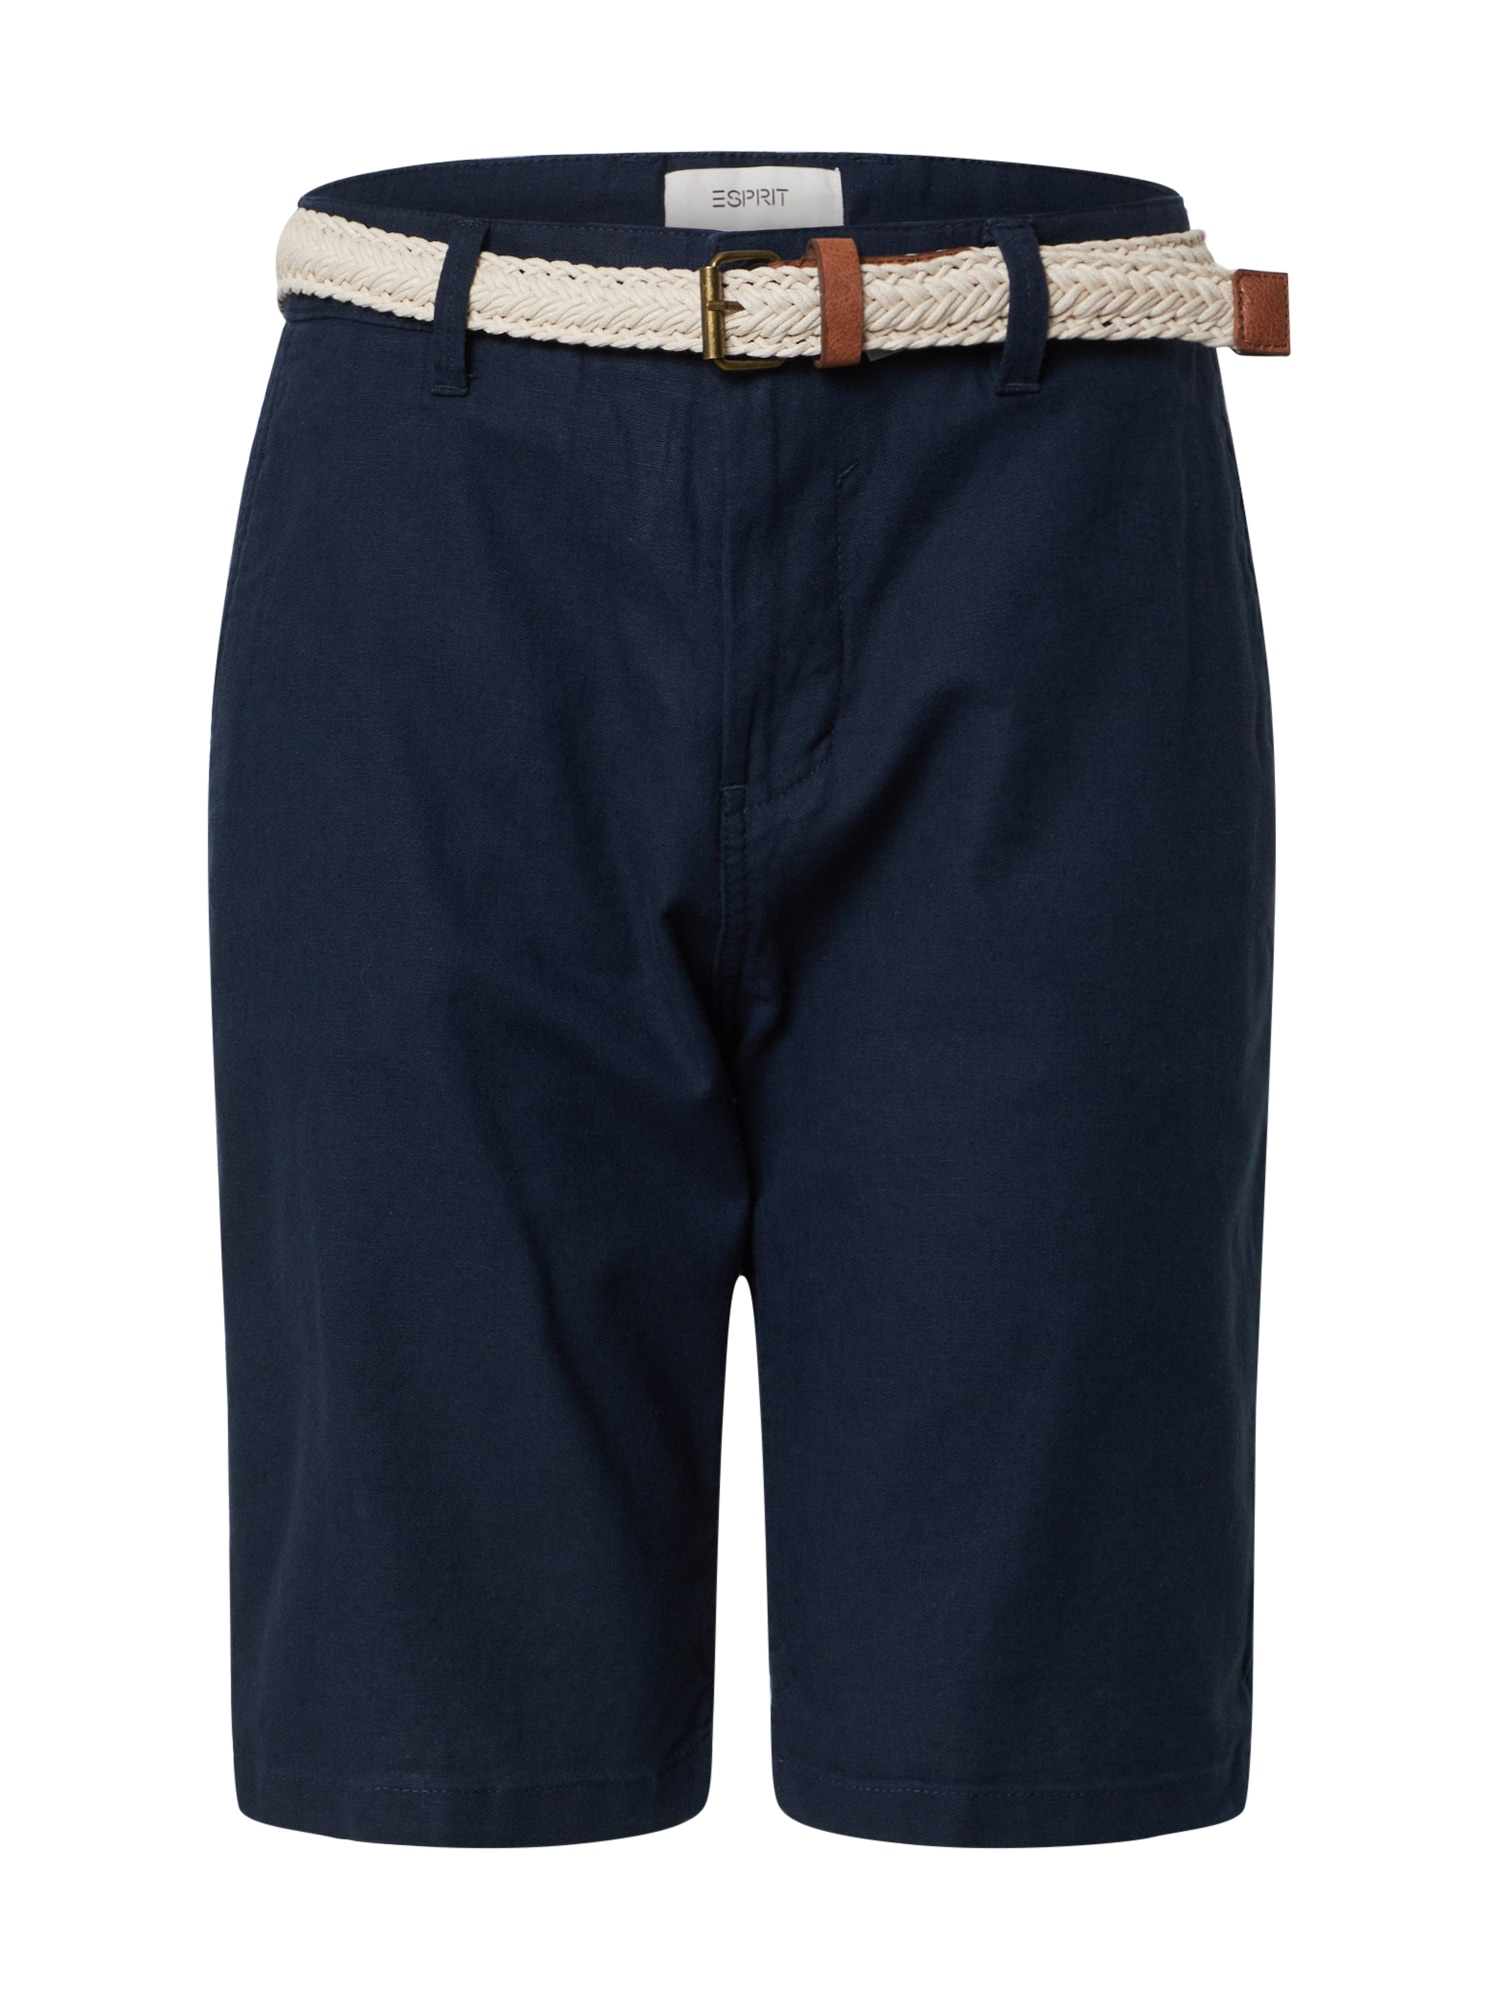 ESPRIT Chino stiliaus kelnės 'F BASIC CO/LI' tamsiai mėlyna